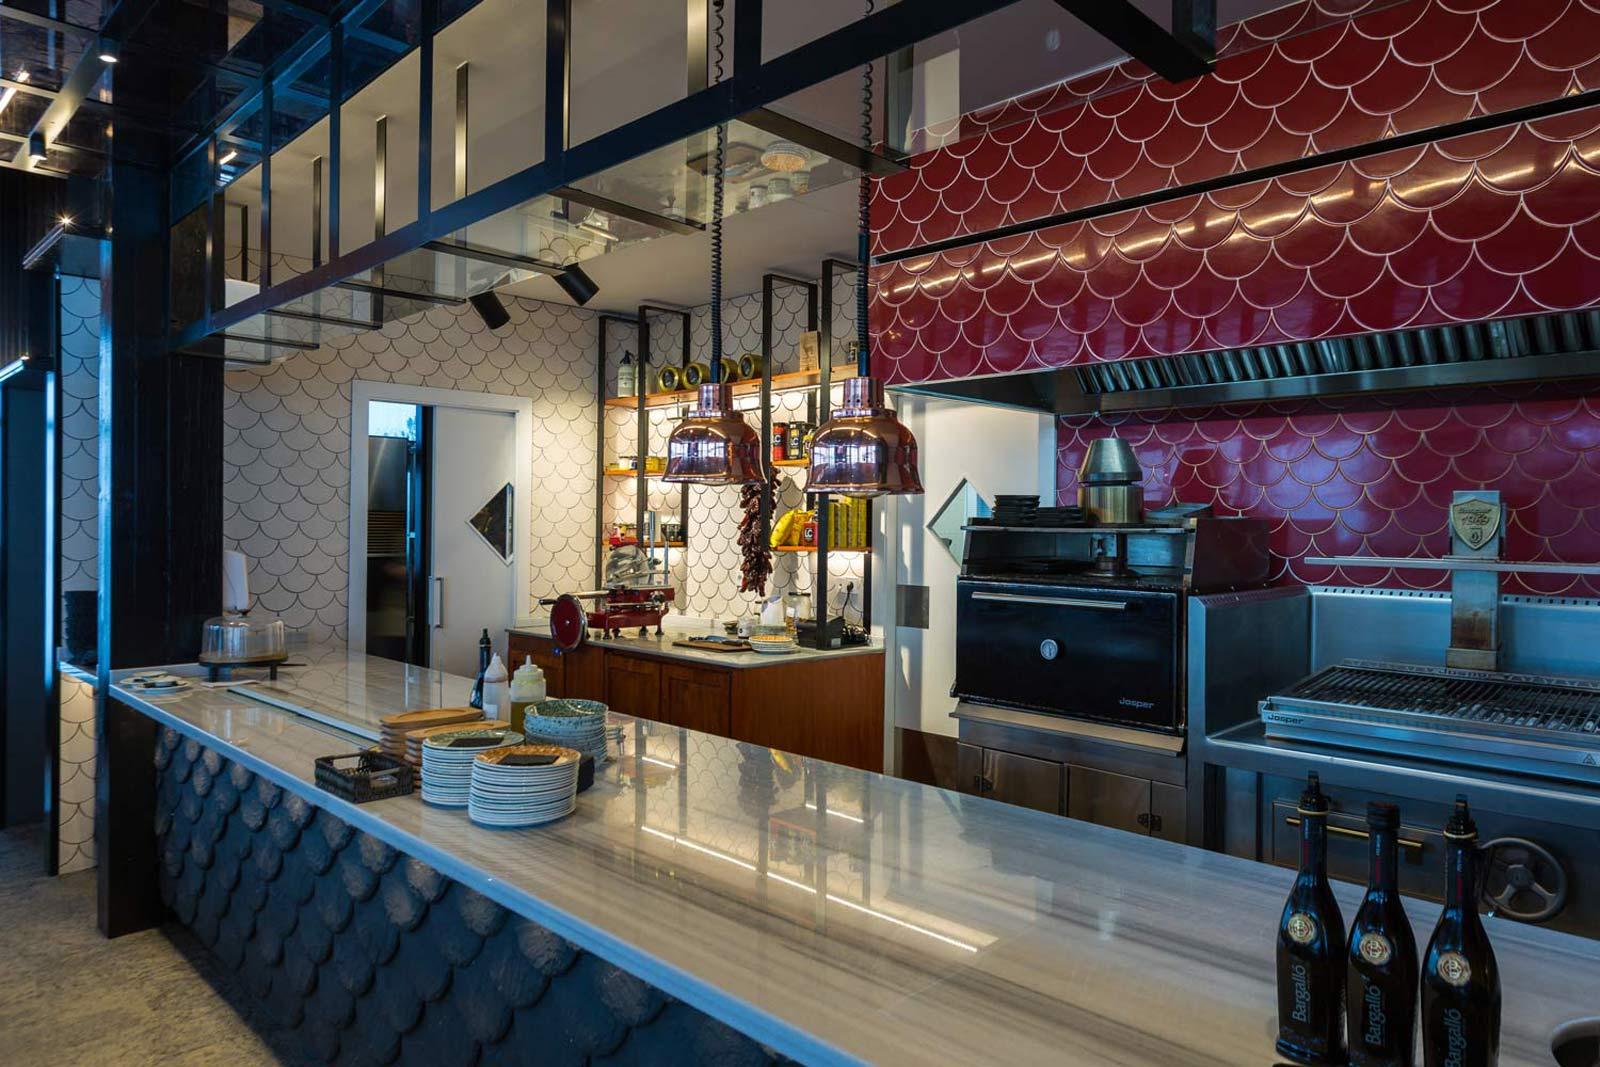 Barra Restaurant Jean Leon Meat and Wine Bar Grandvalira, Andorra - Rosa Colet Design